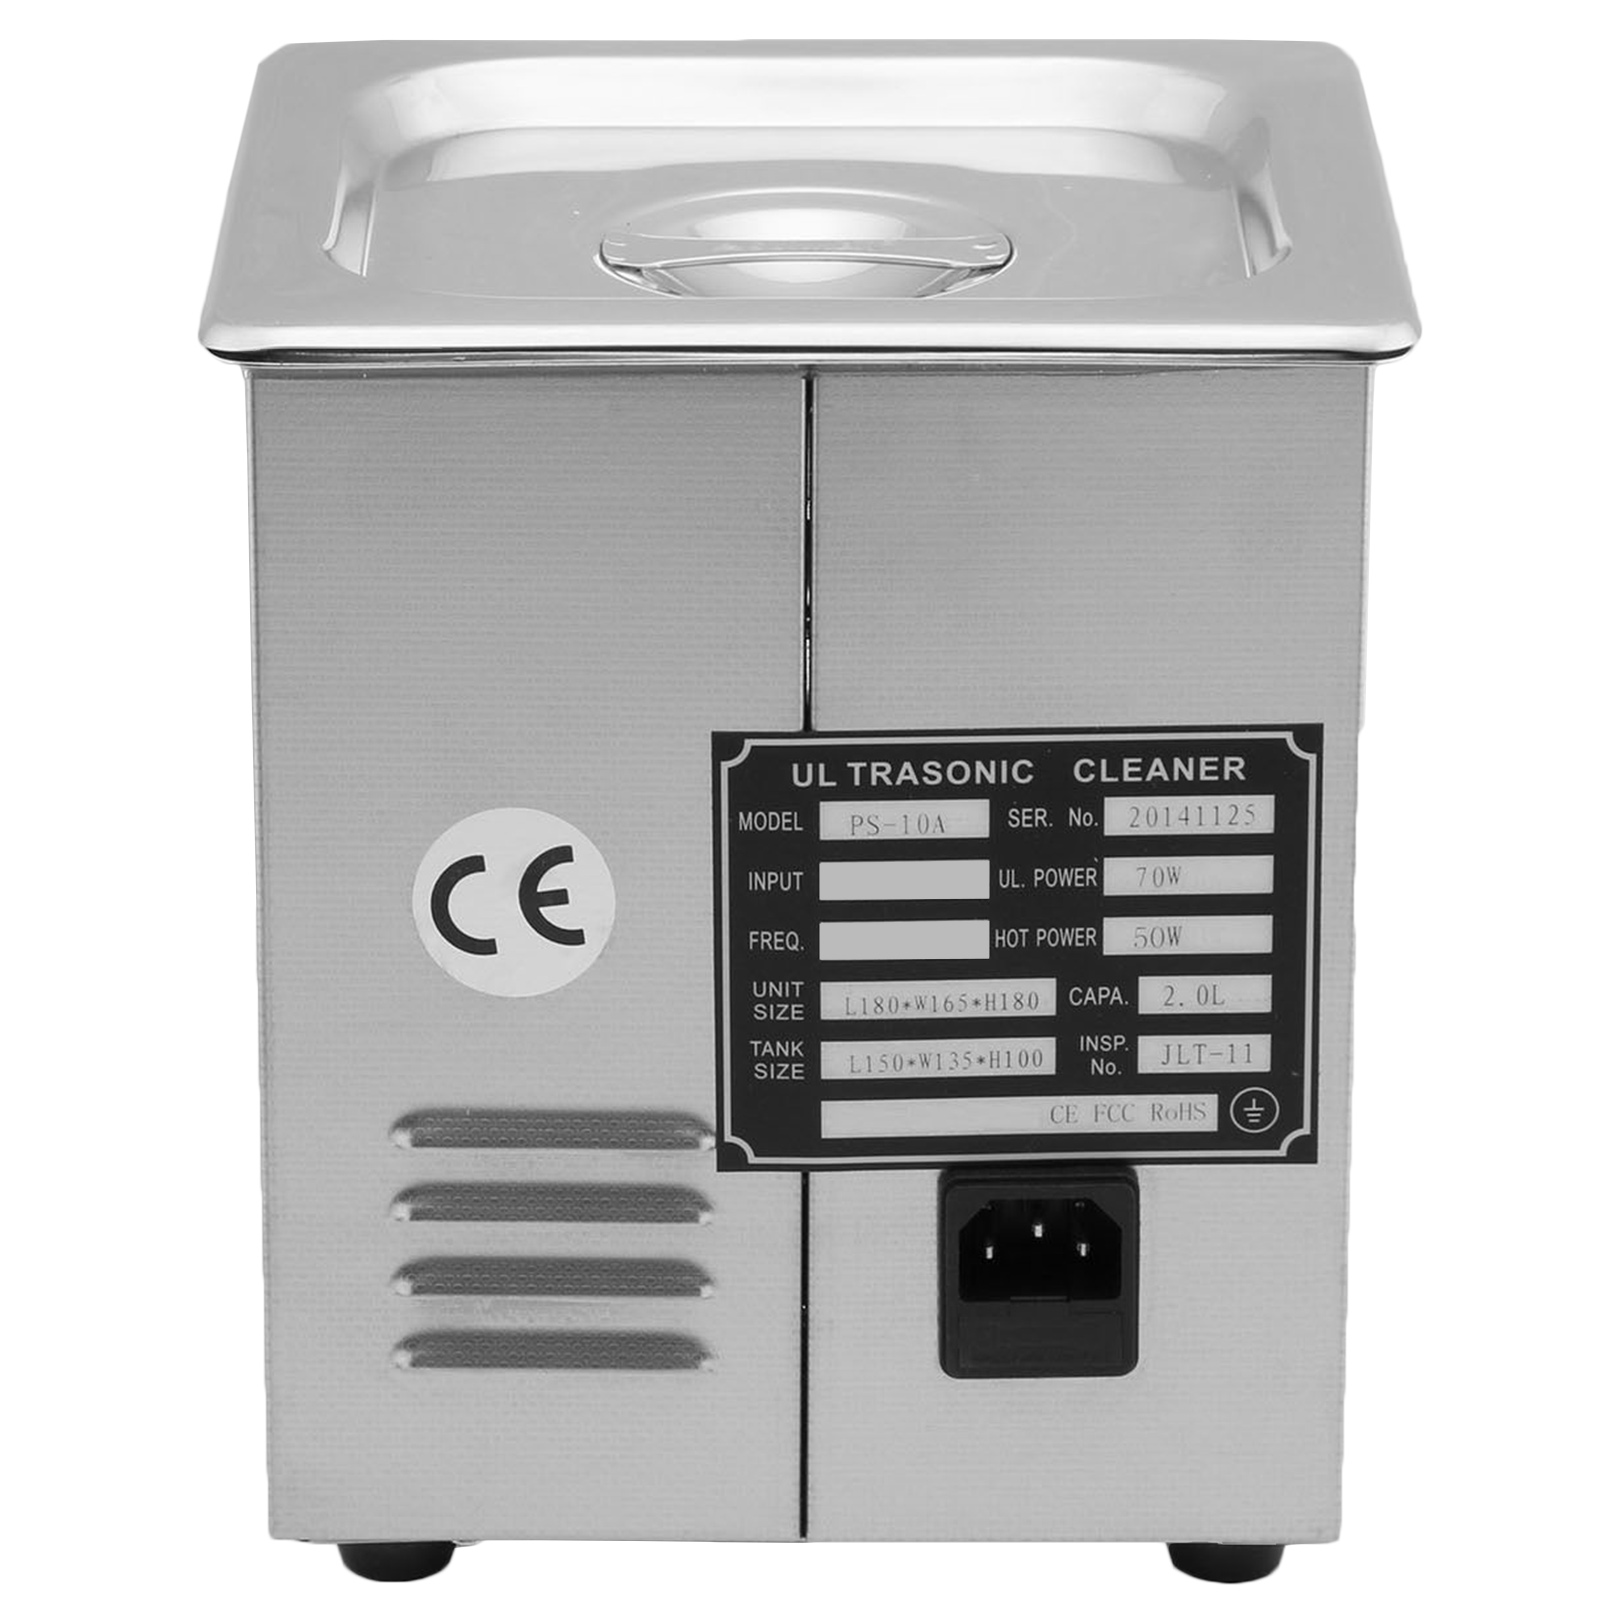 Vaschetta-Vasca-Ultrasuoni-Lavatrice-Pulitore-Ad-Ultrasuoni miniatura 27